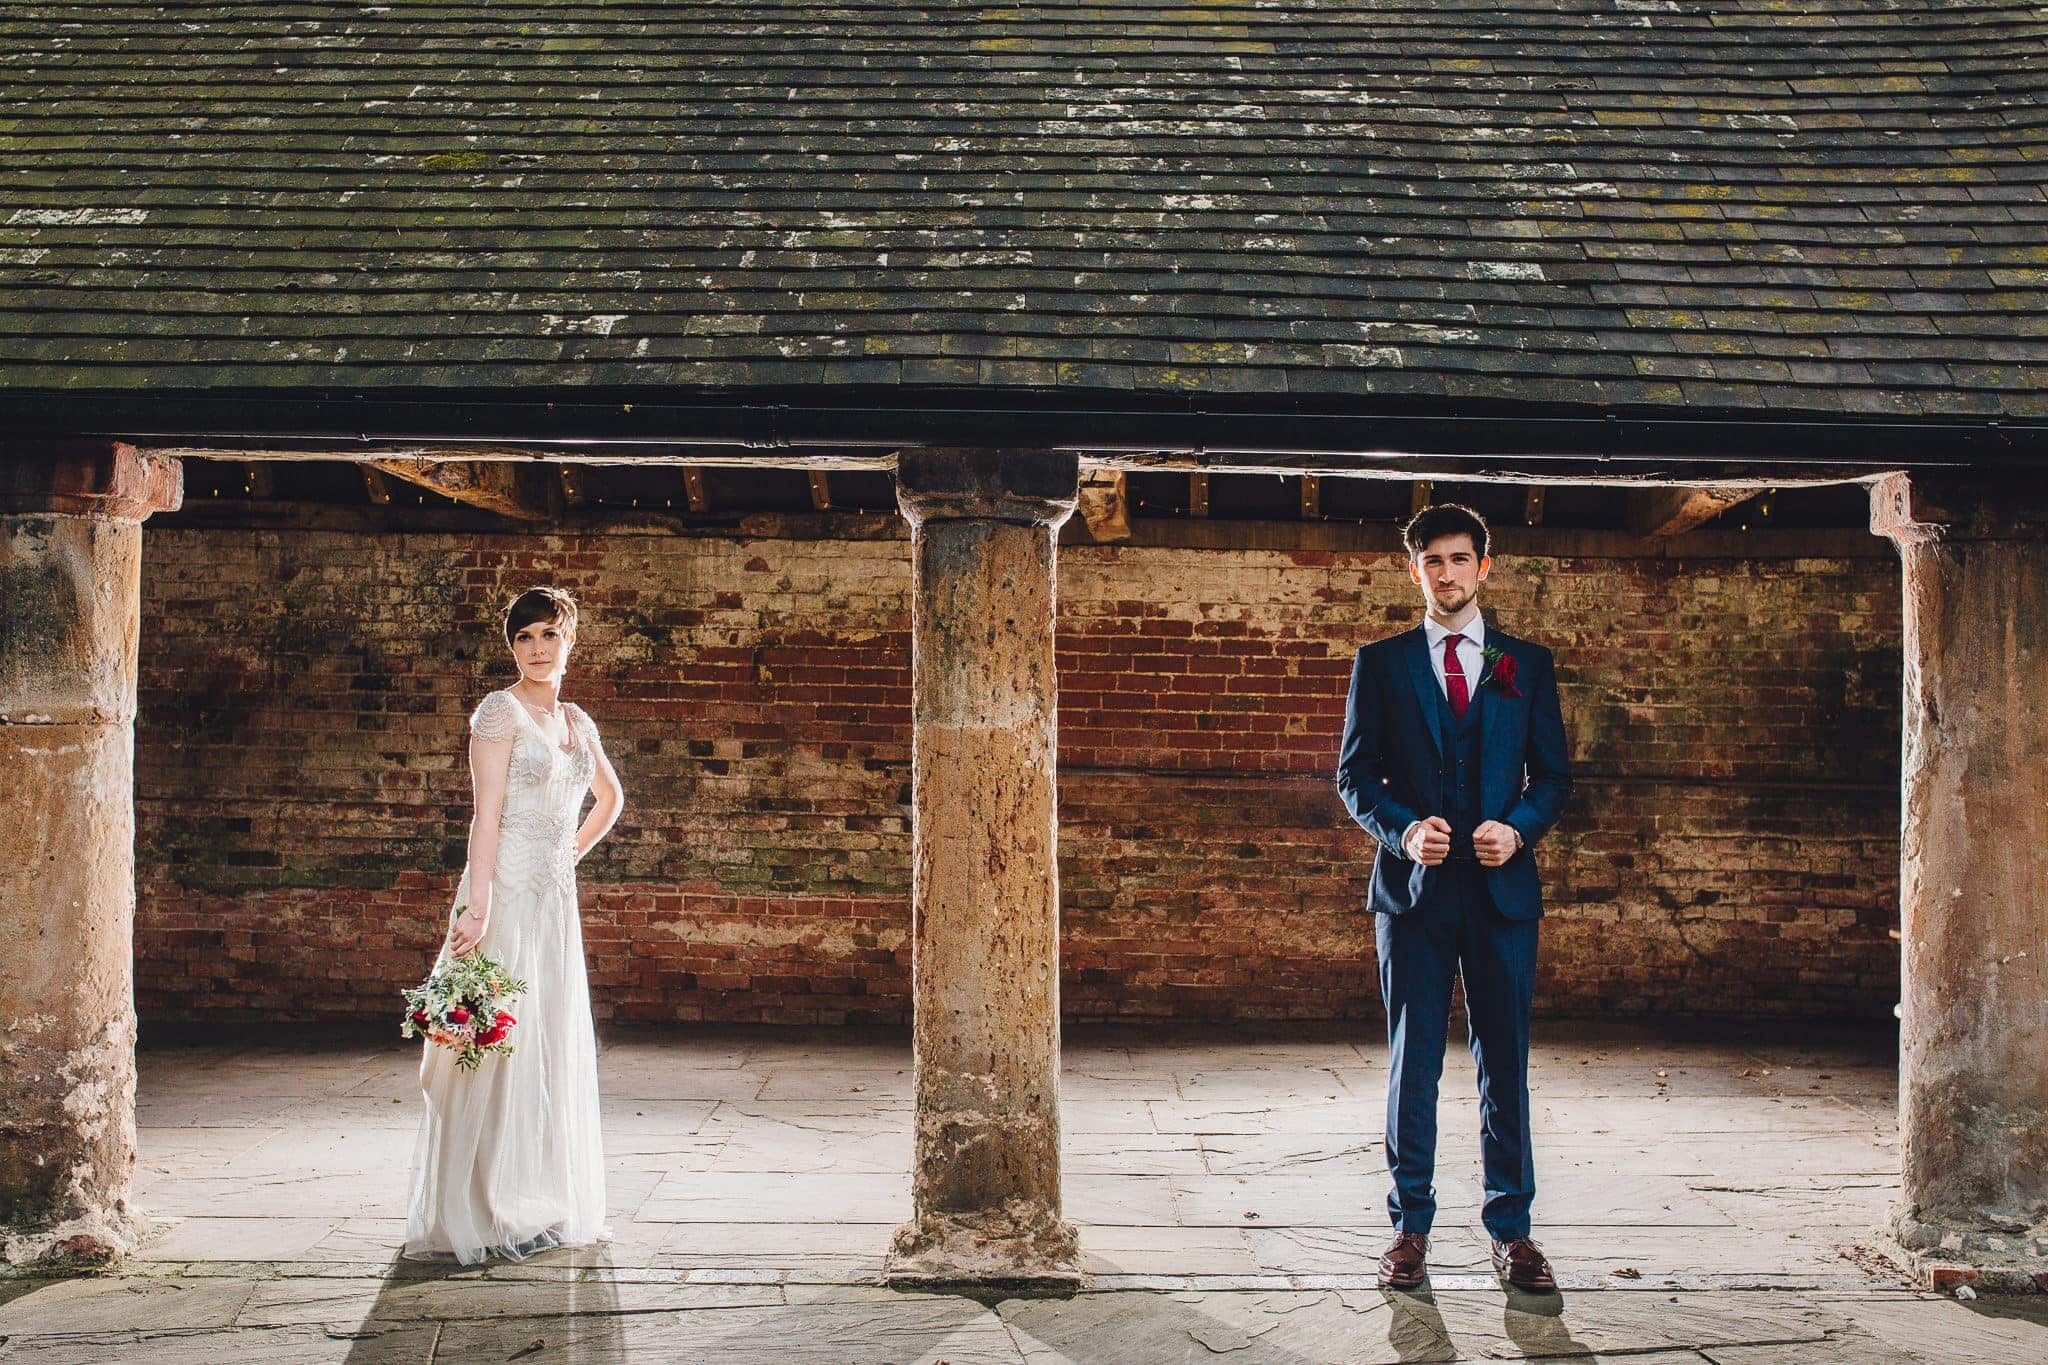 creative wedding portrait